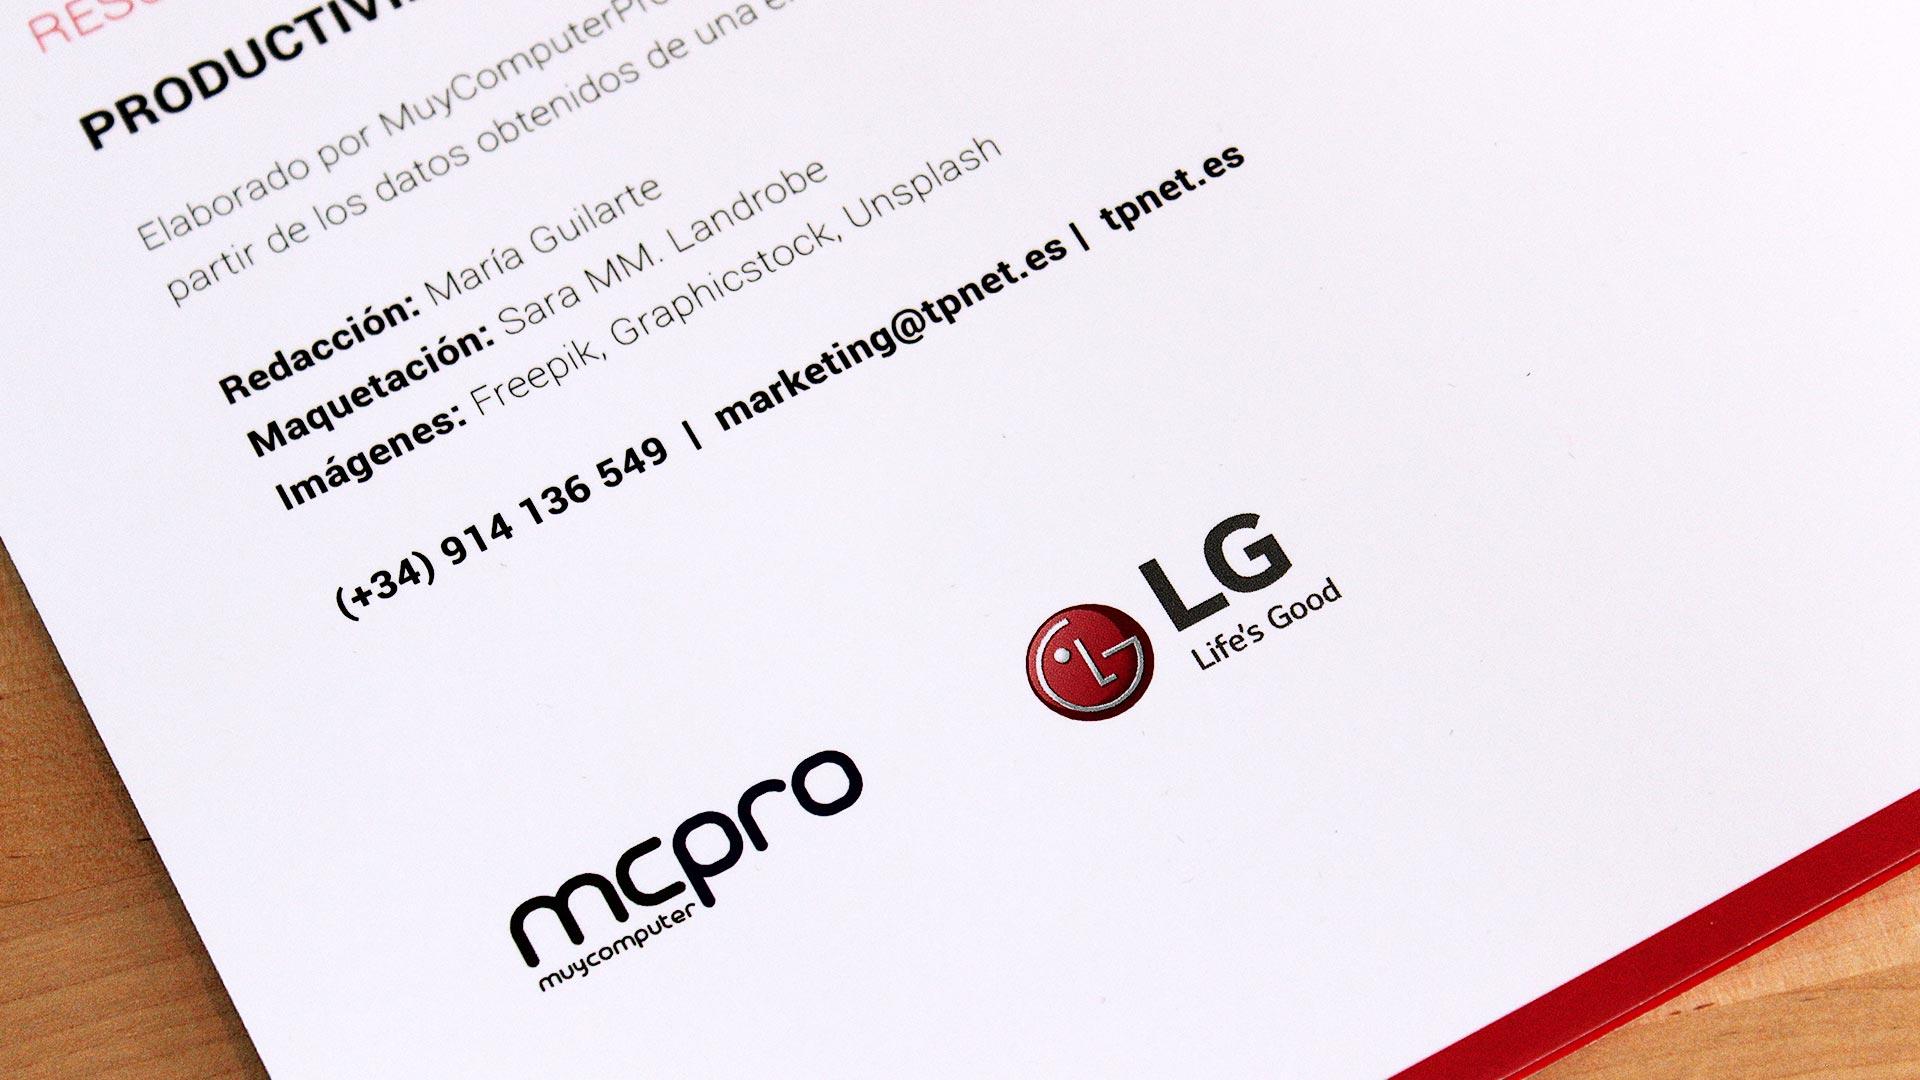 LG--content-marketing-informe-resumen-ejecutivo-ebook-ergonomia--2017_16